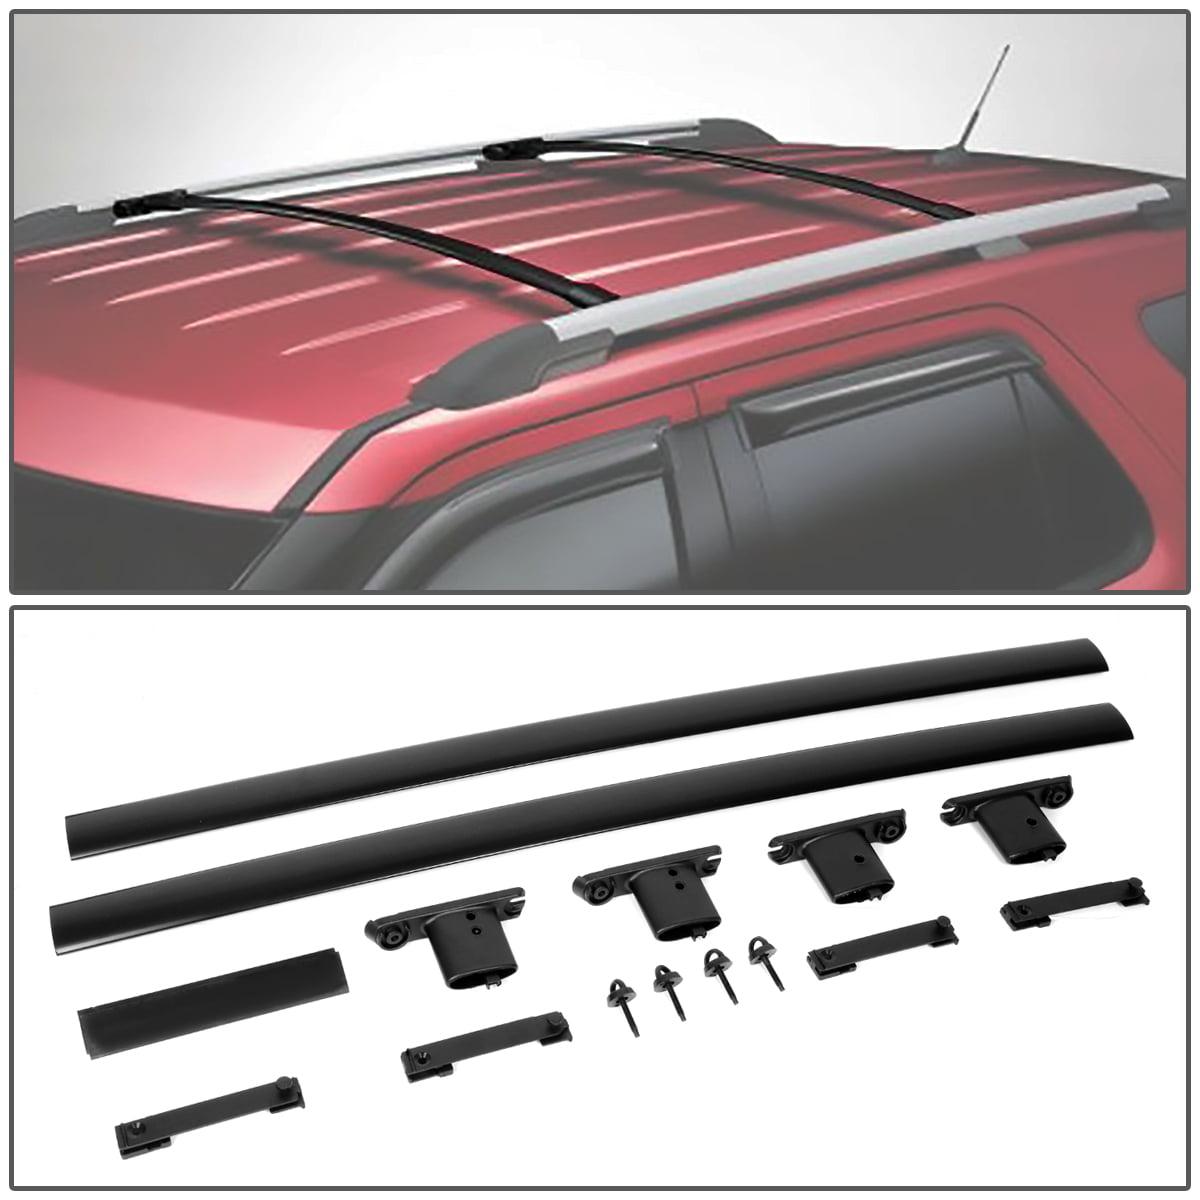 OE Fit Matte Black Roof Rack Luggage//Cargo Rail Crossbar Bar For 11-15 Explorer